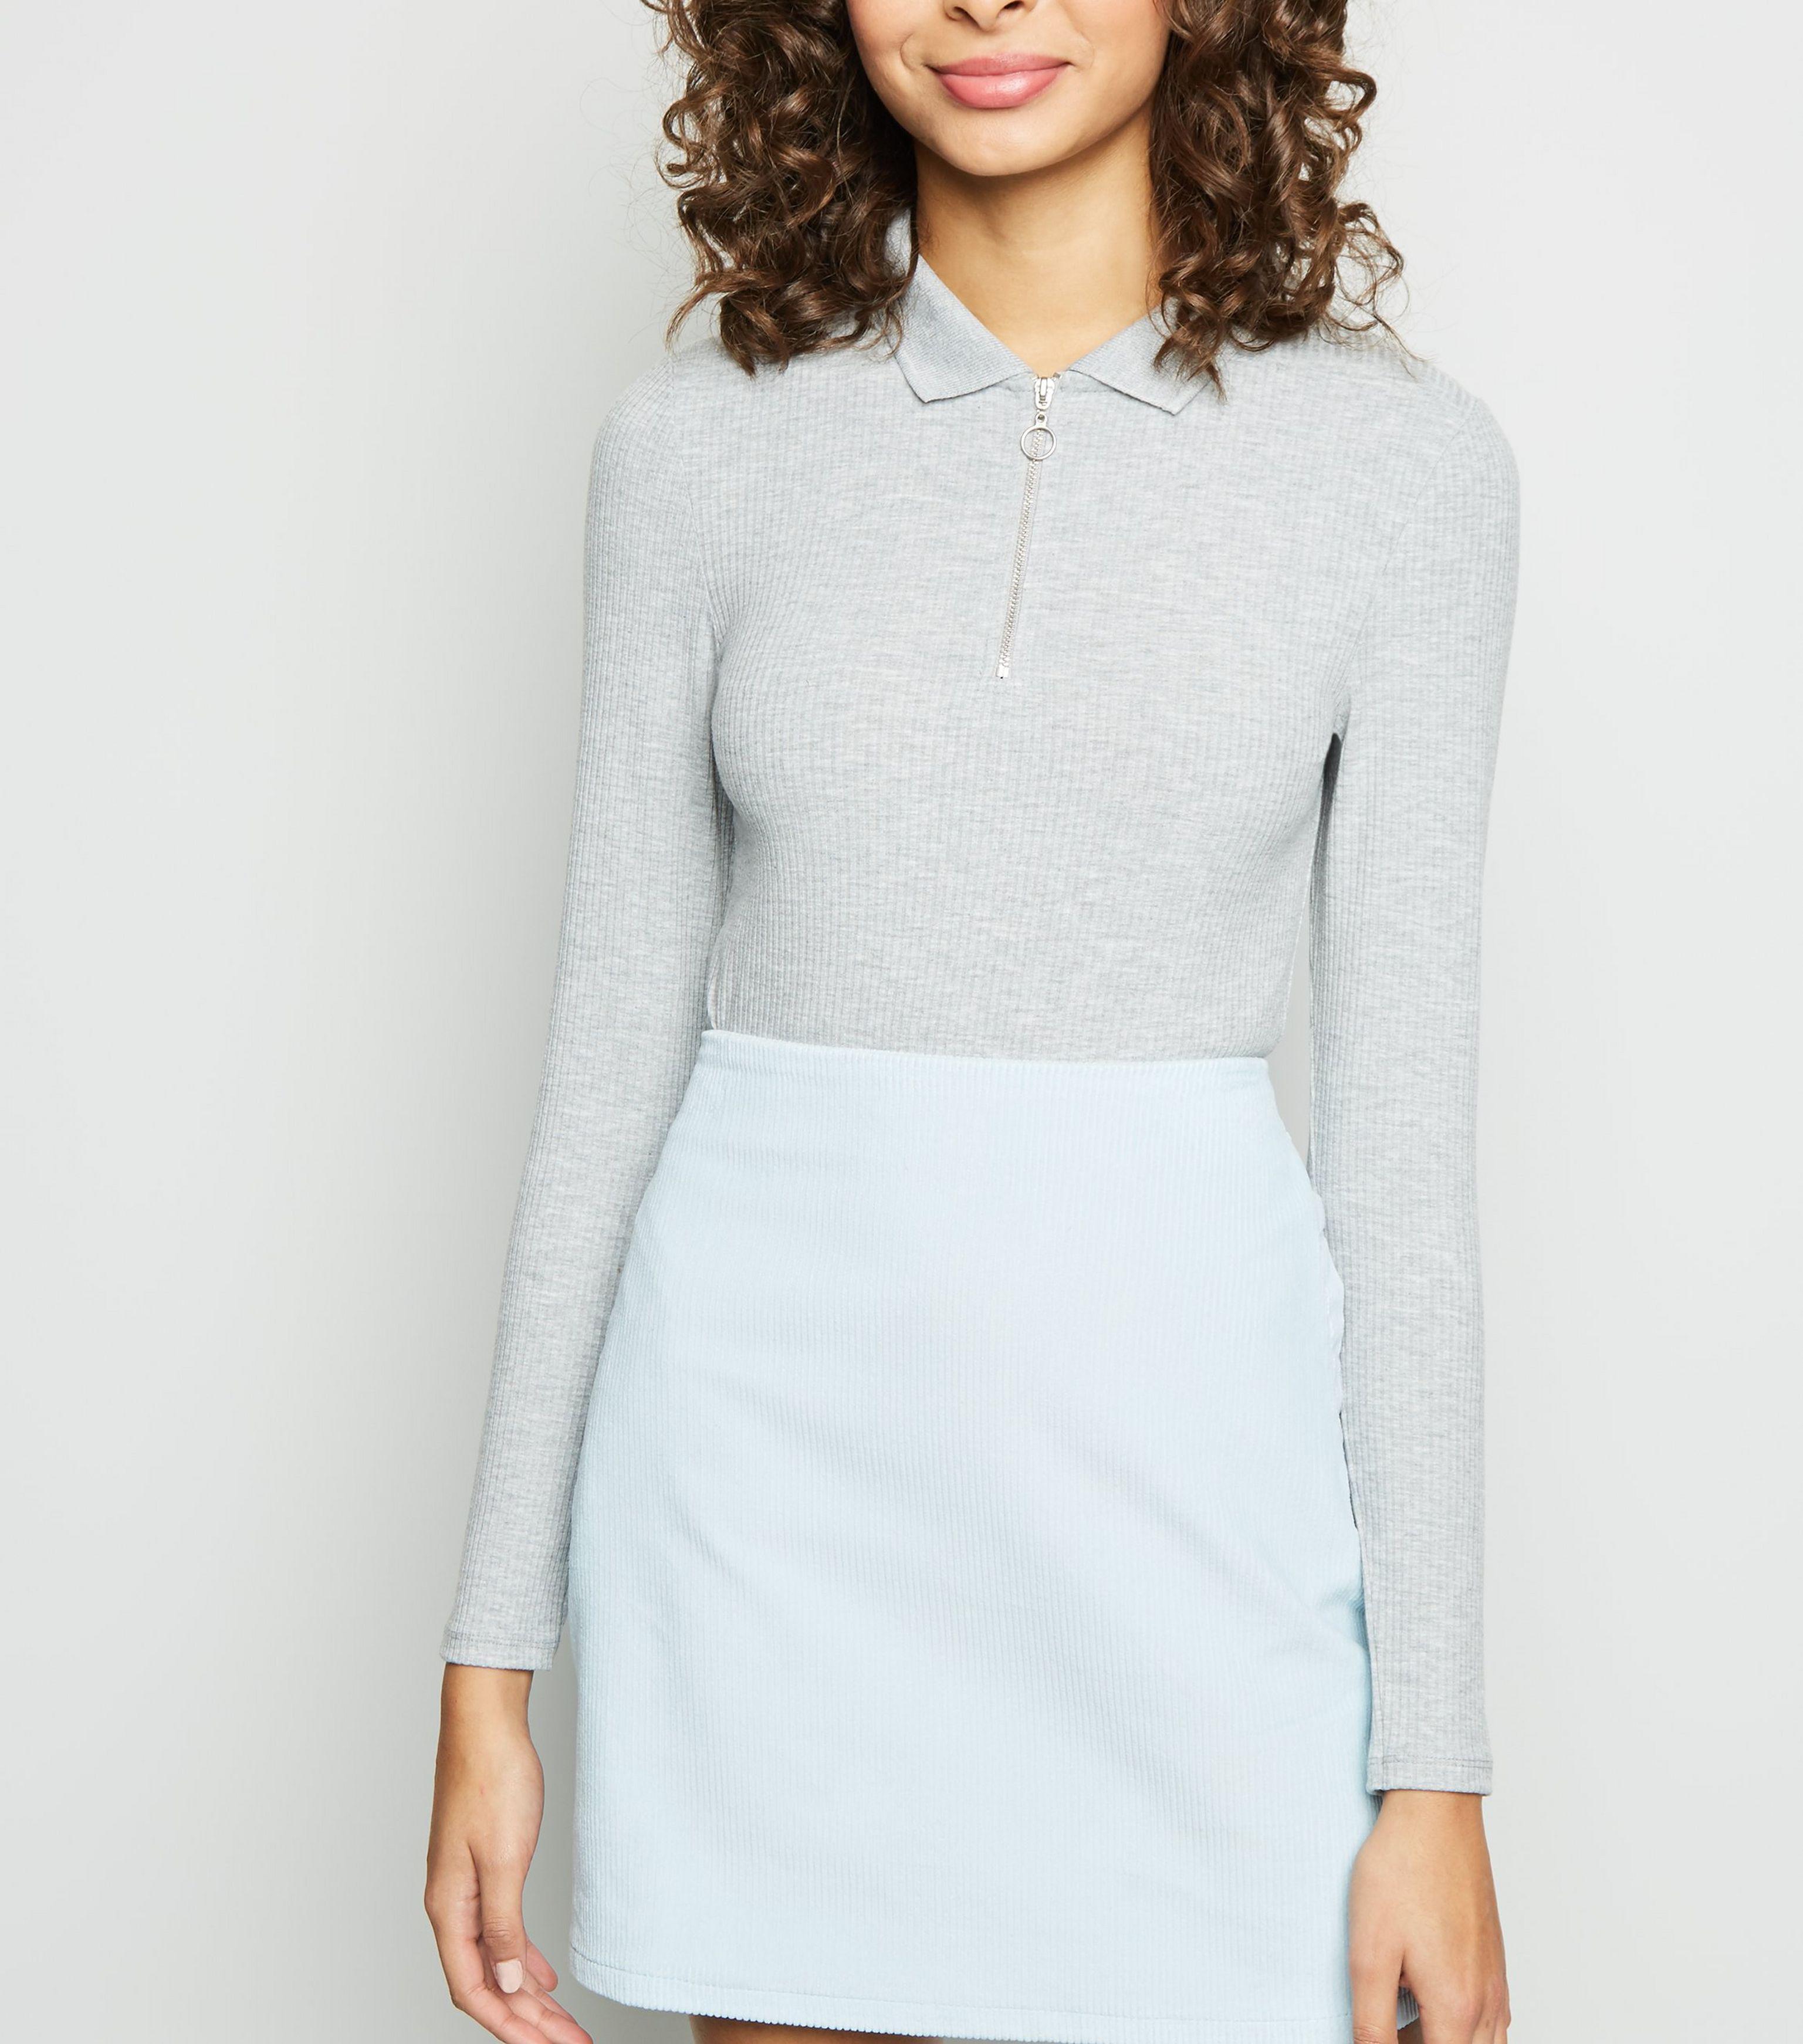 abe80cd0ce New Look Pale Blue Corduroy Pocket Side Mini Skirt in Blue - Lyst